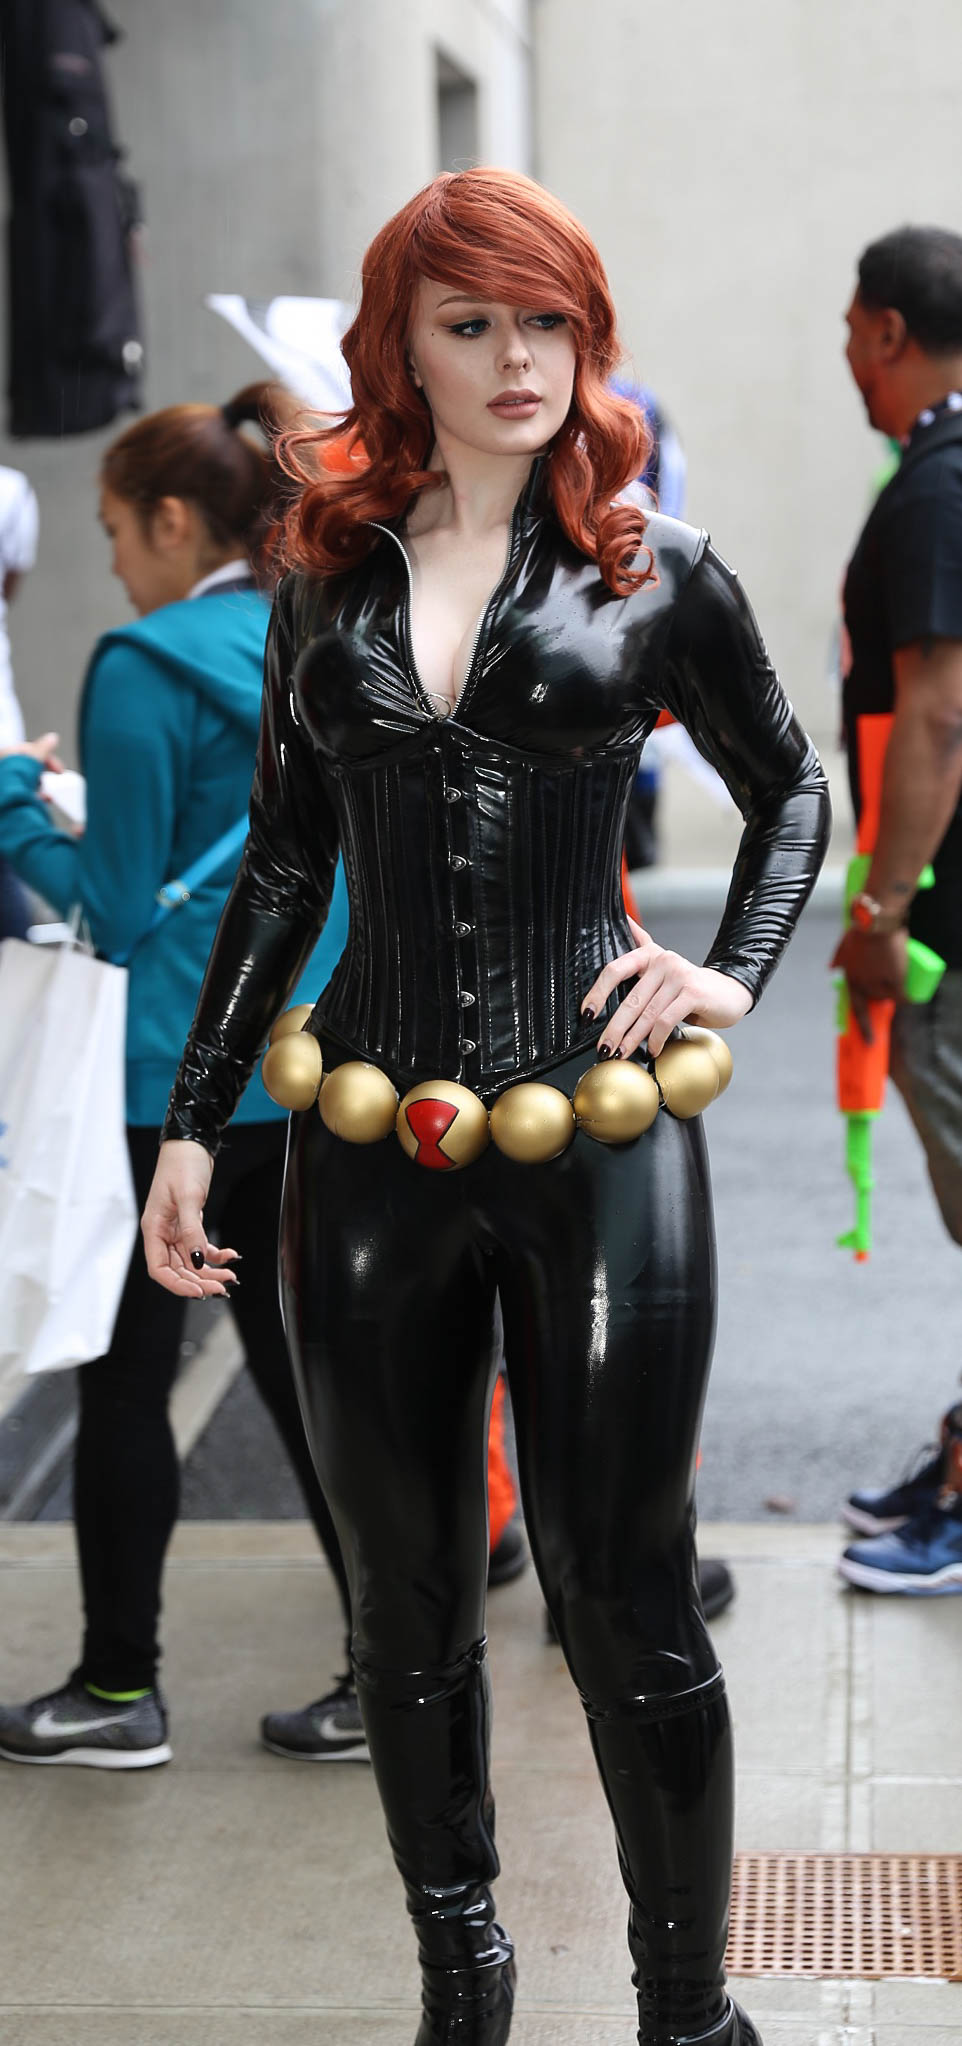 File New York Comic Con 2016 Black Widow 29598412434 Jpg Wikimedia Commons